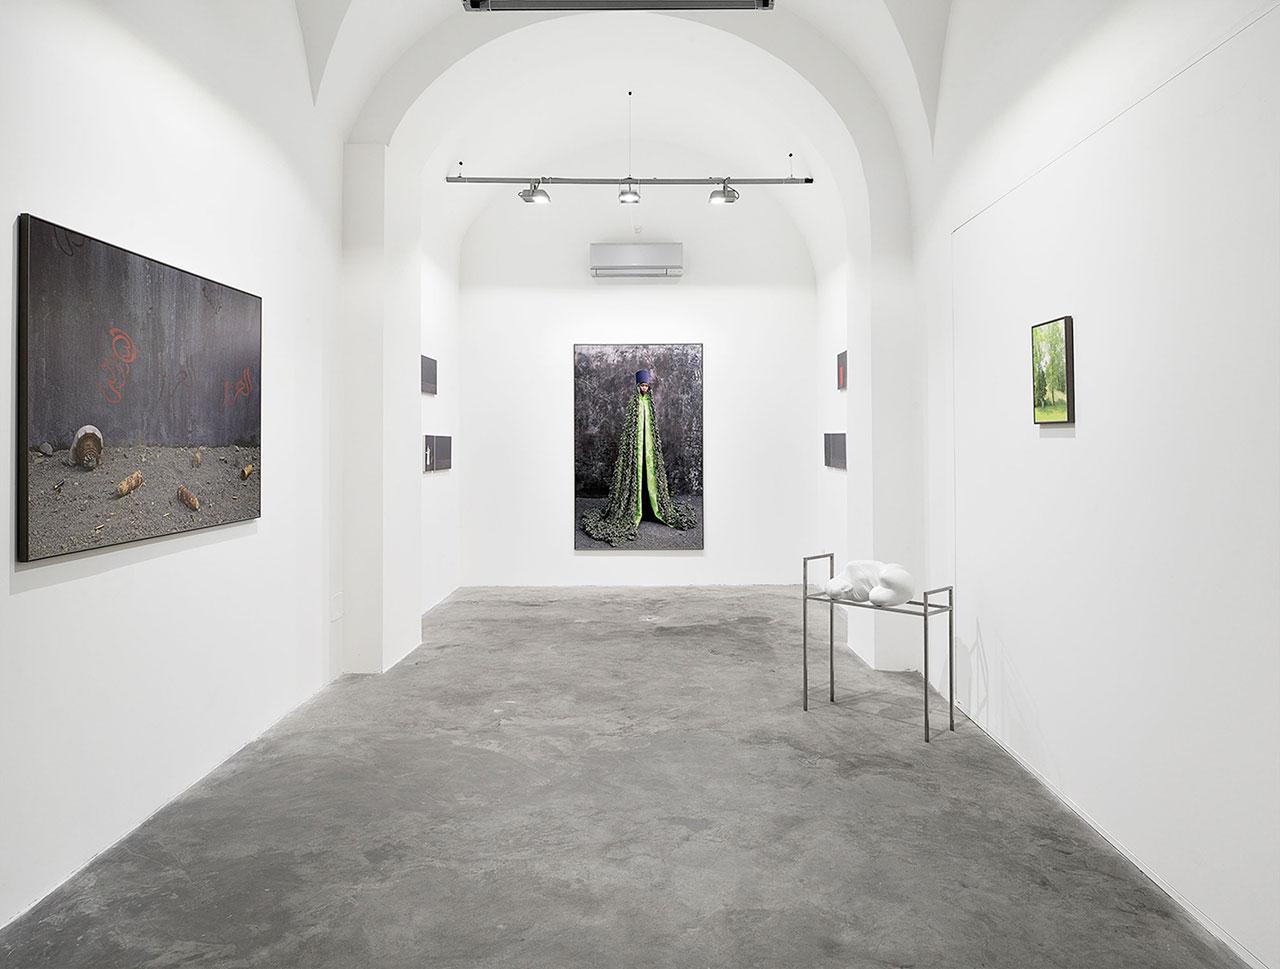 Maïmouna Guerresi,Talwin 2015-16, Installation view fromMateria Gallery-Rome. Copyright© Maïmouna Guerresi,courtesyMariane Ibrahim Gallery-Seattle&Matèria Gallery-Rome.